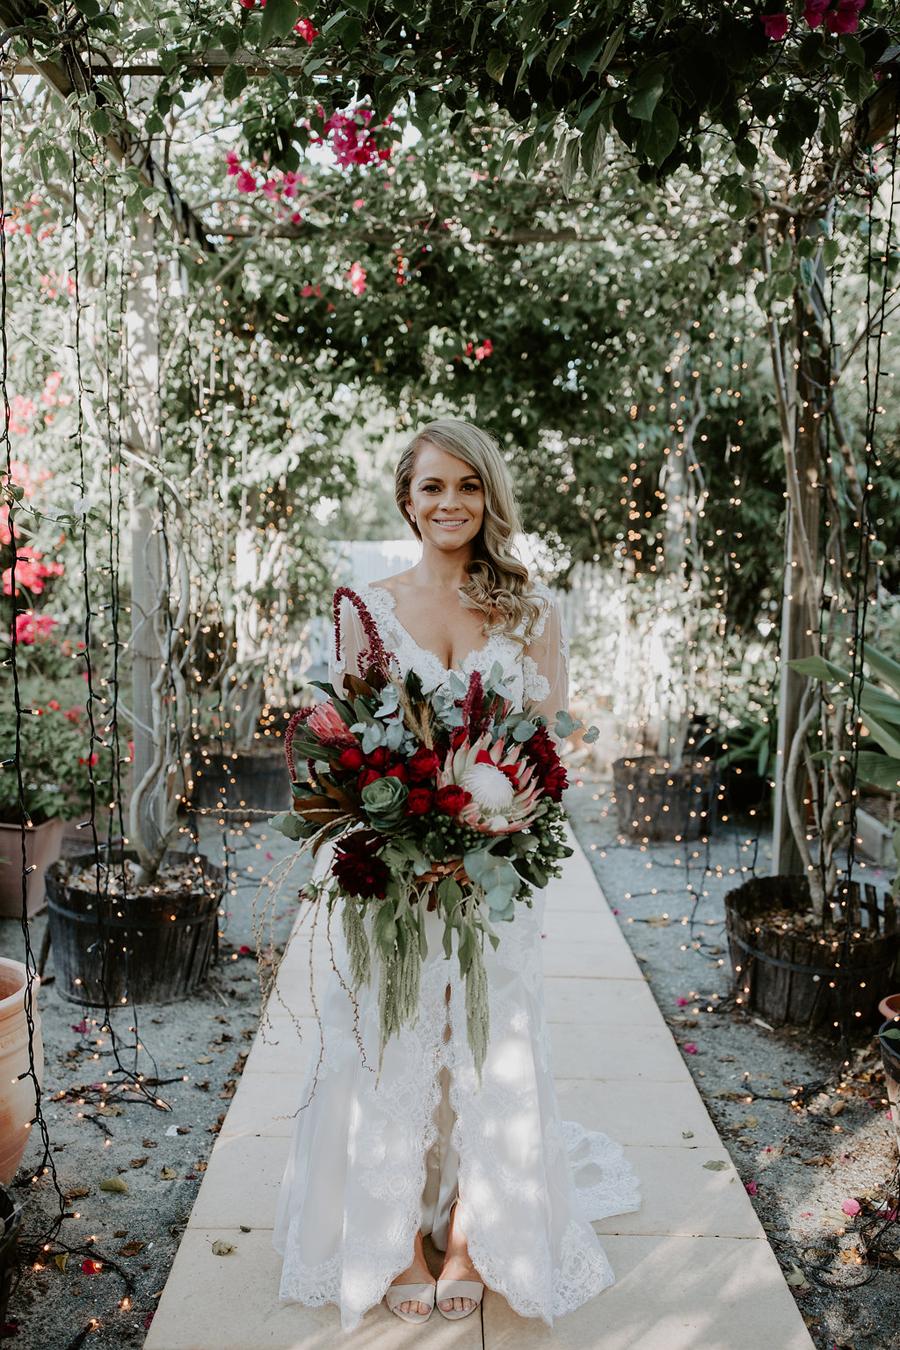 osteria-casuarina-wedding-venue-tweed-coast-weddings-coastal-garden-reception-real-wedding028.jpg